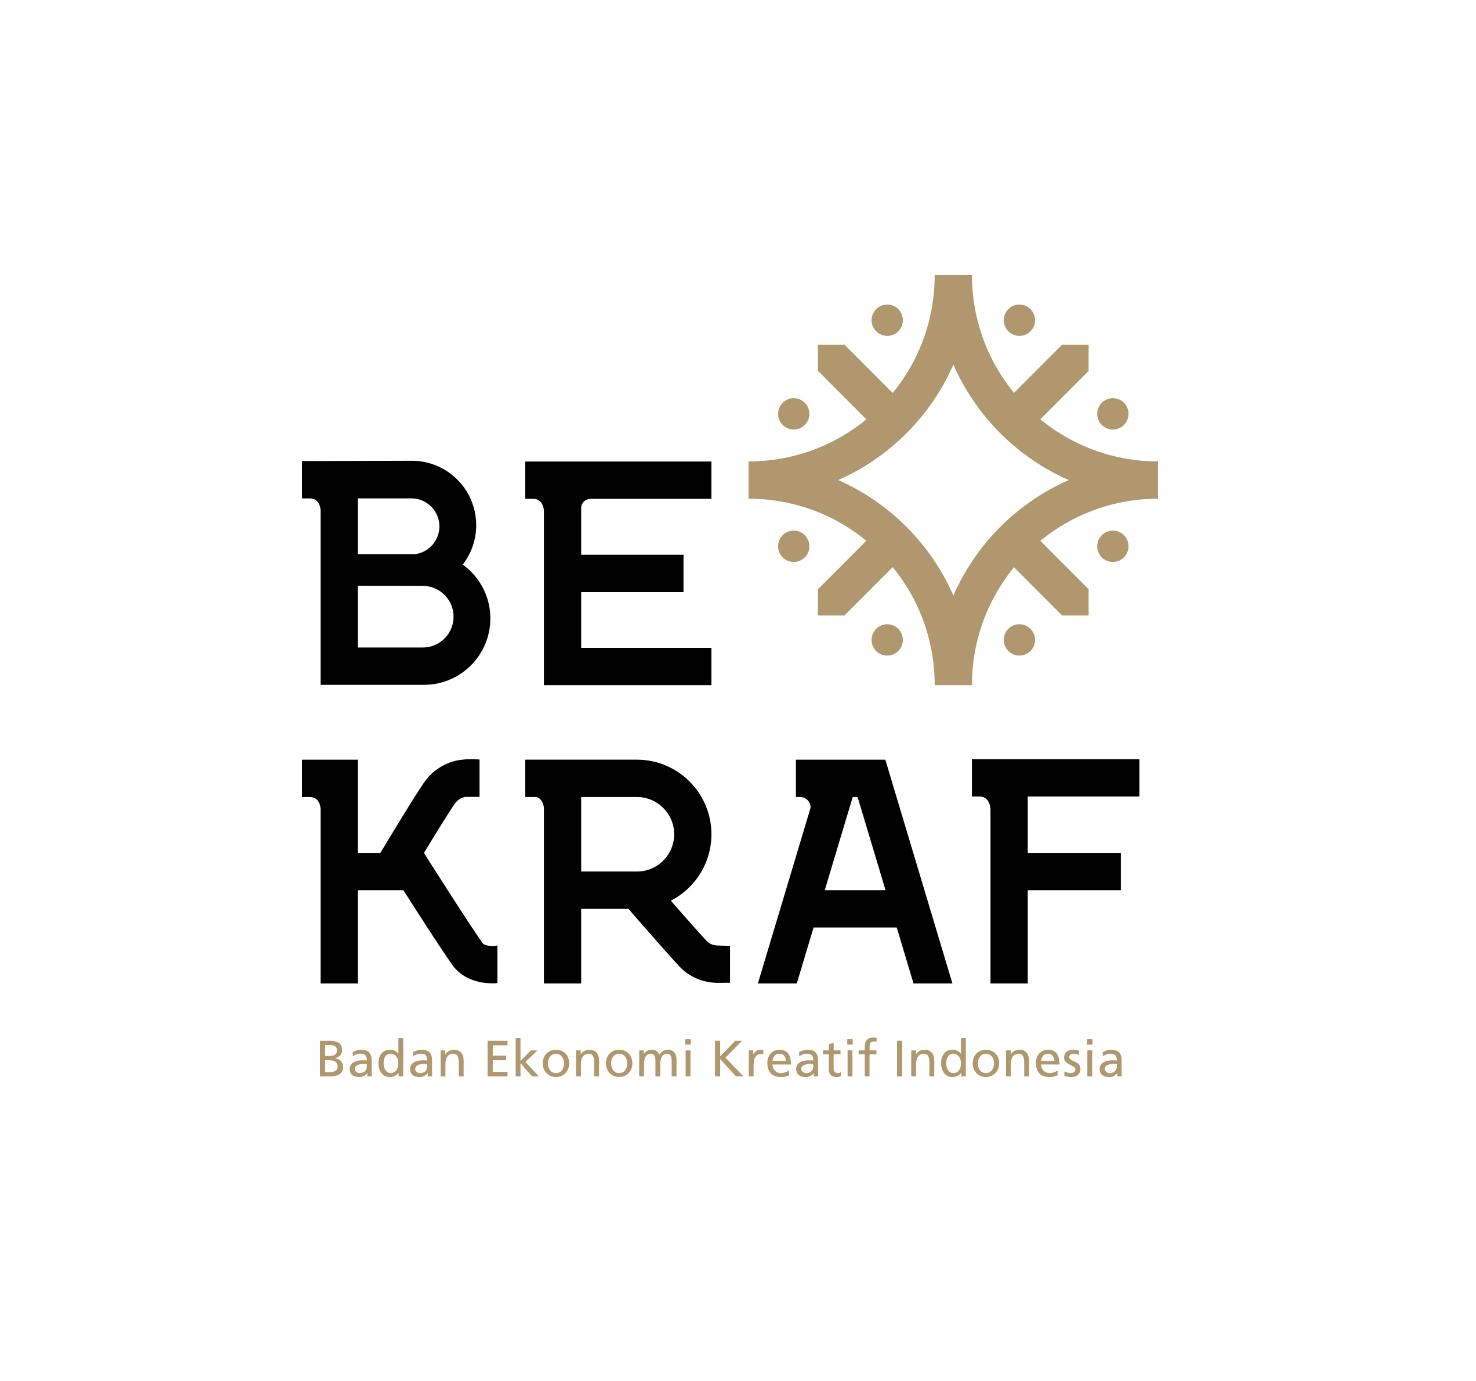 BEKRAF Developer Day 2019 - Pontianak